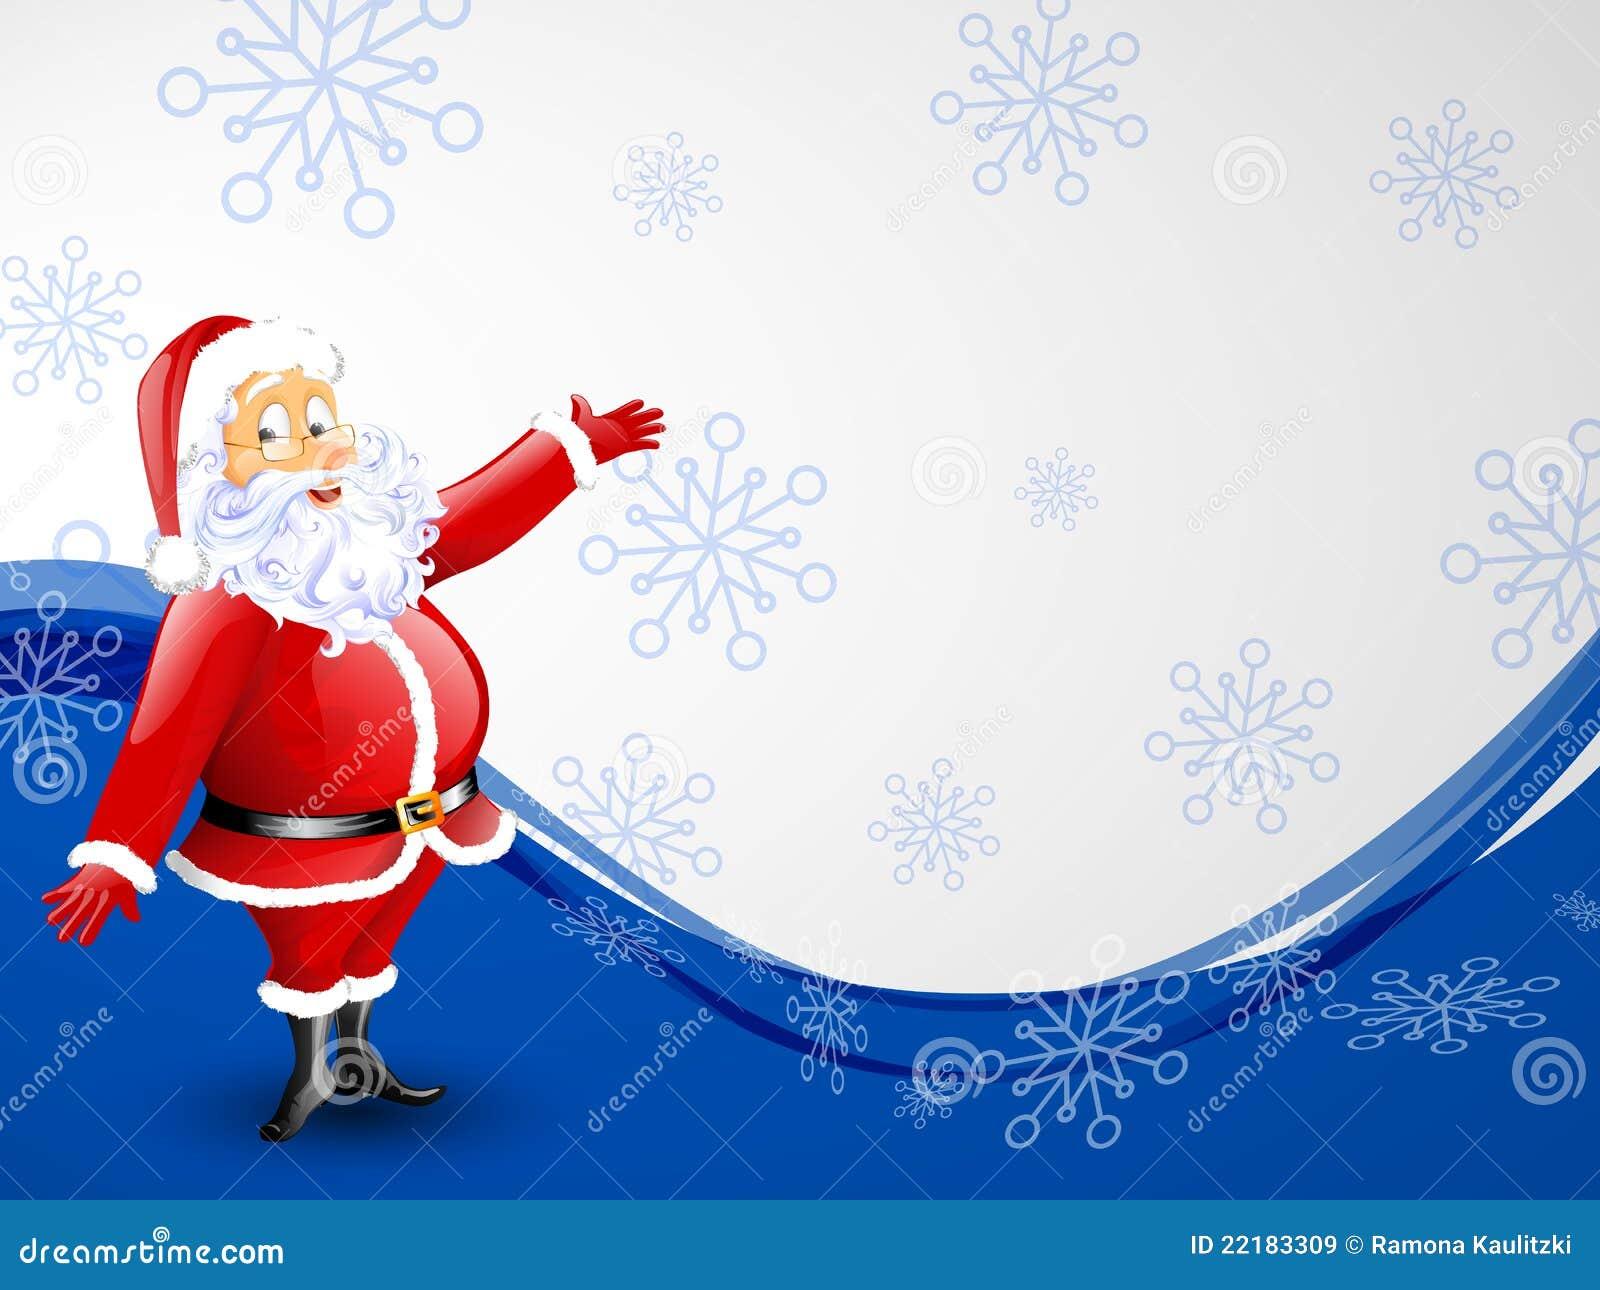 santa claus christmas card isolated smile - Santa Claus Christmas Cards